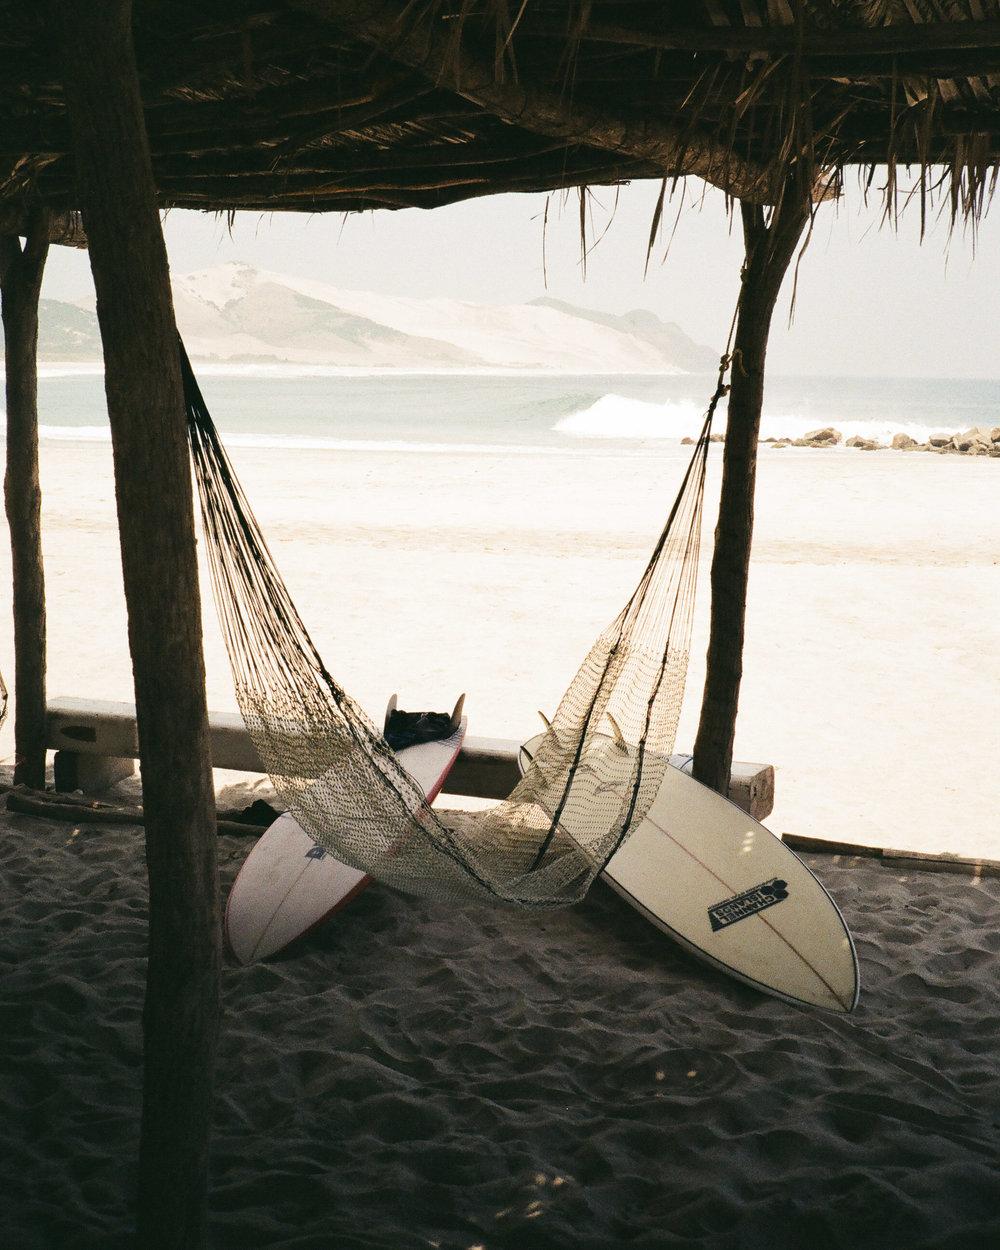 captainbarto-blog-adambartoshesky-model-nautica-client-mexico-surf-trip-mexican-mirage-september-2018-2048.jpg